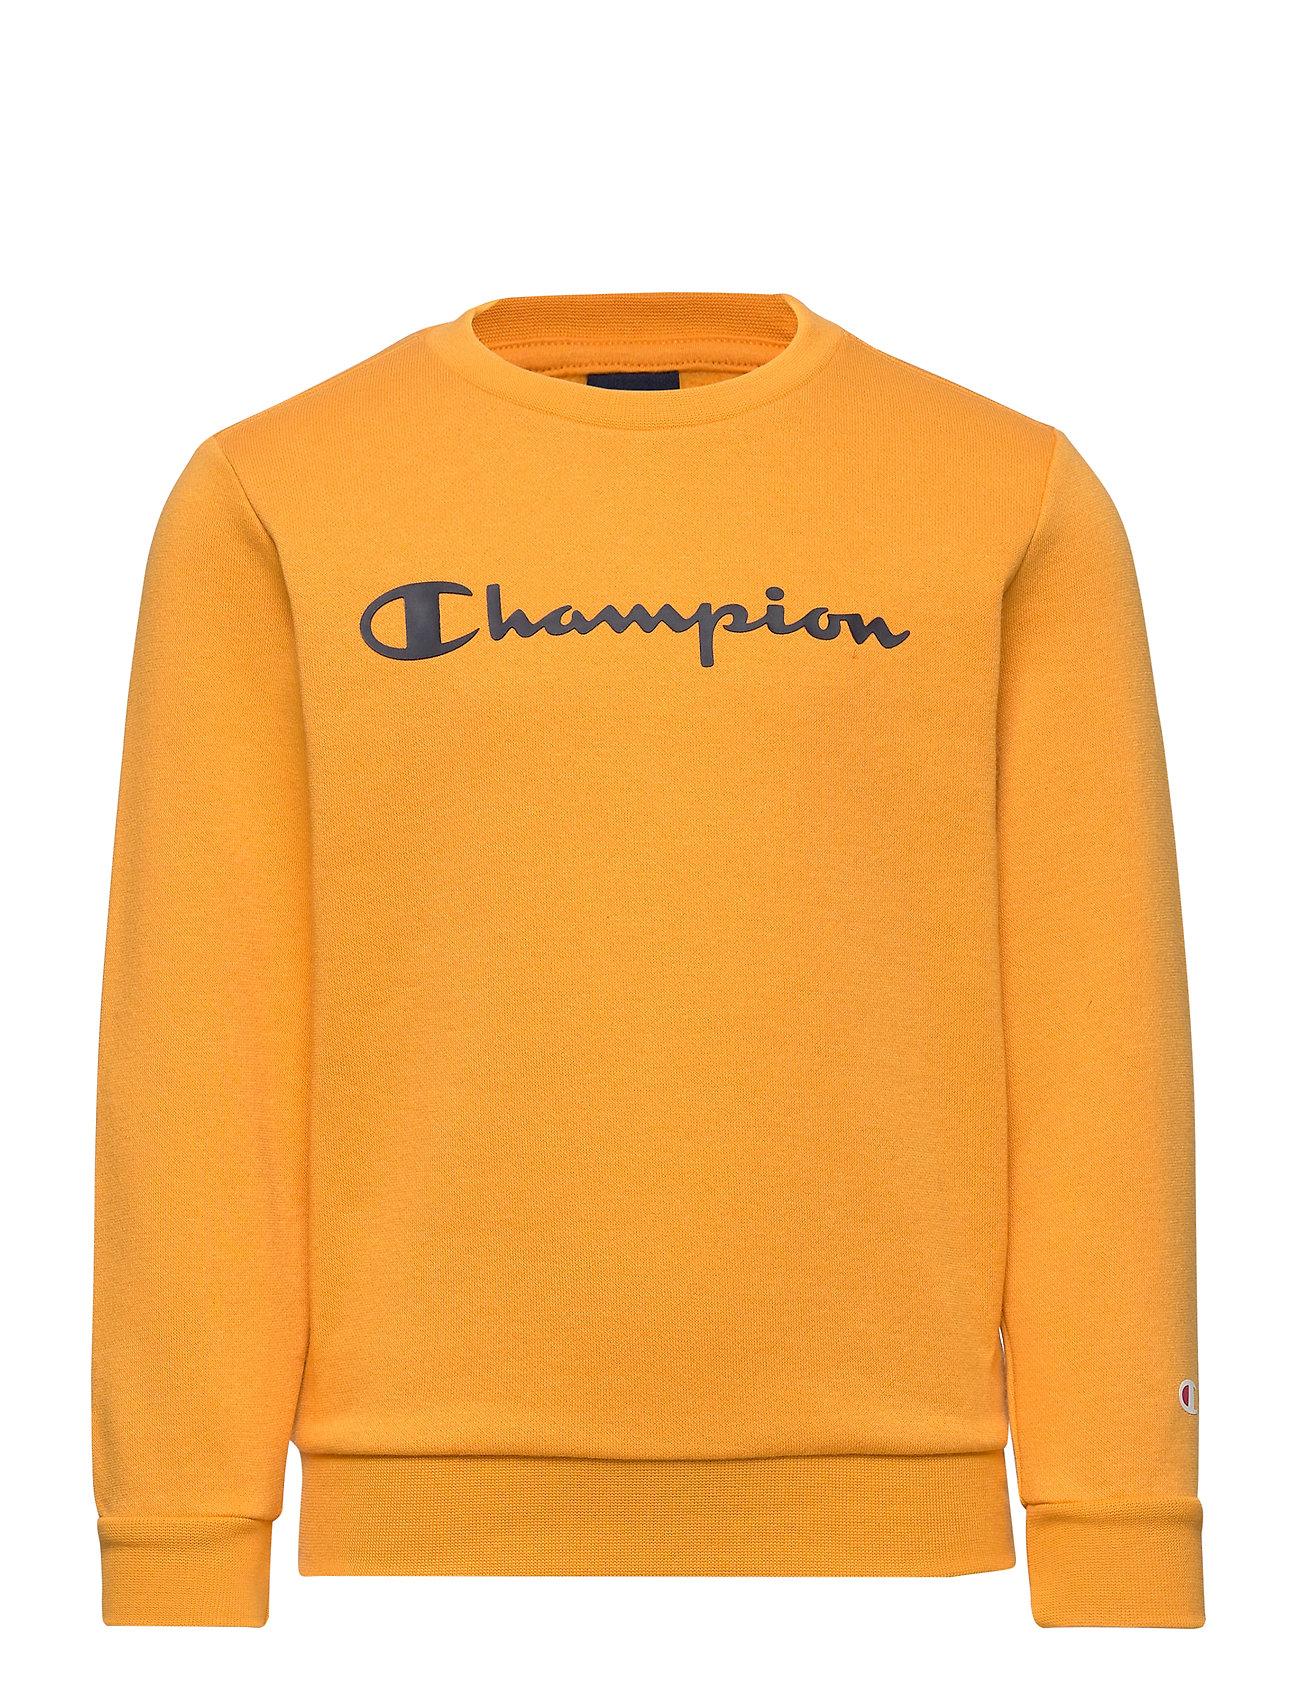 Crewneck Sweatshirt Sweatshirt Trøje Gul Champion